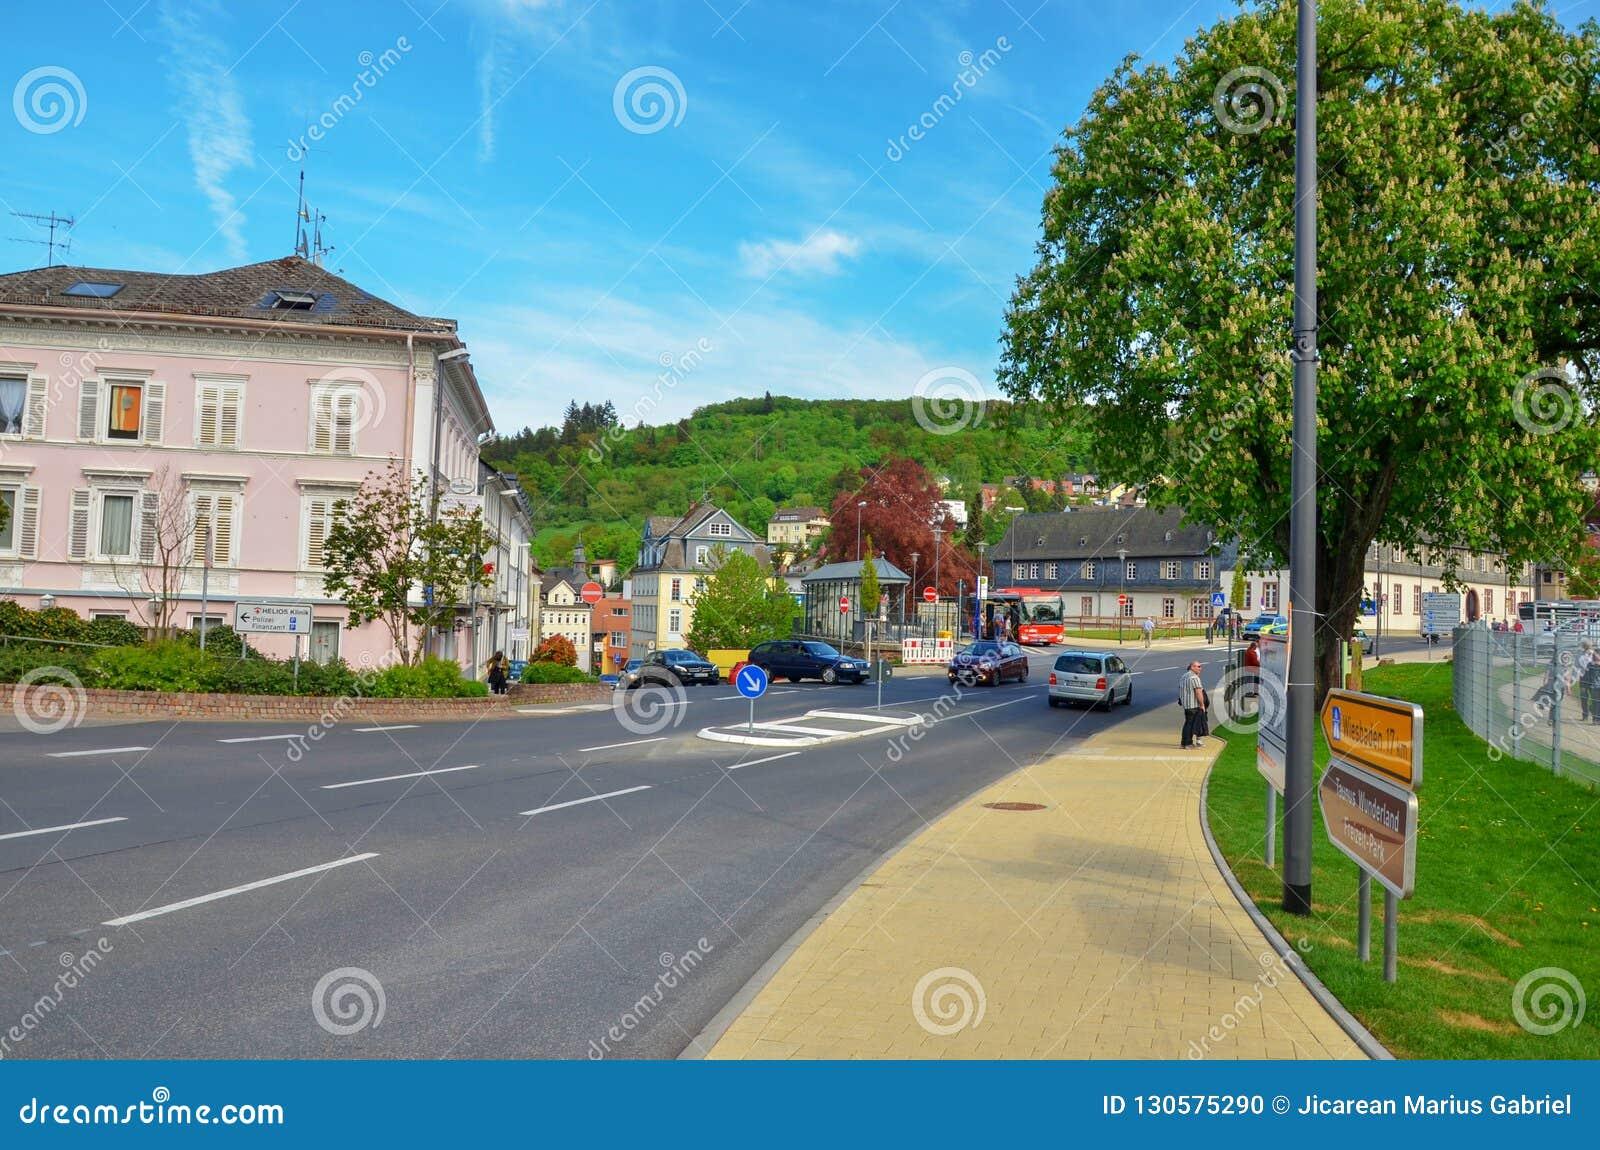 Casinò cattivo Schwalbach, Germania